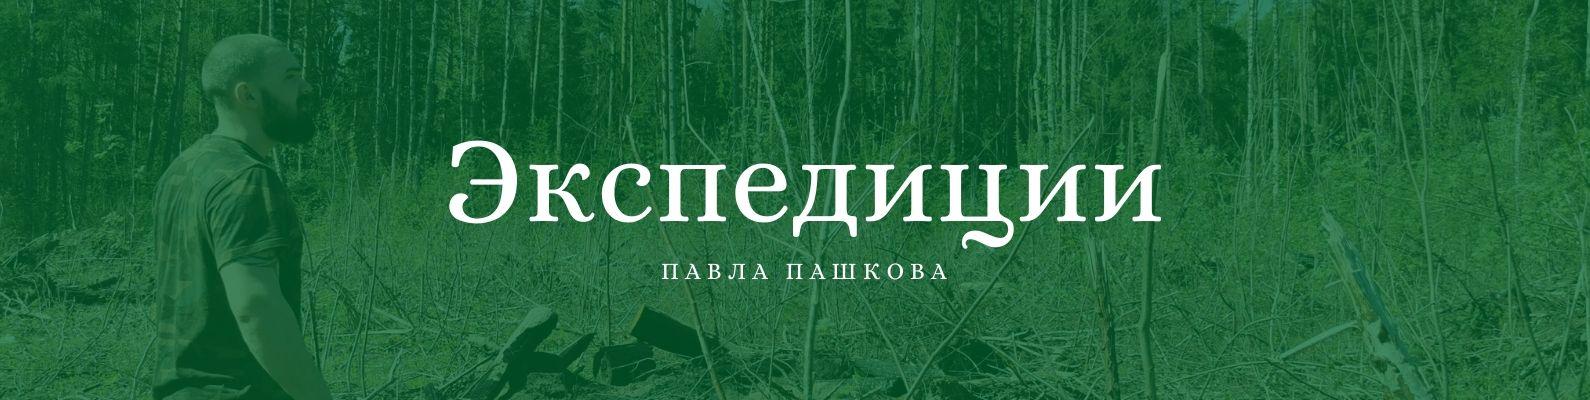 Проекты Павла Пашкова